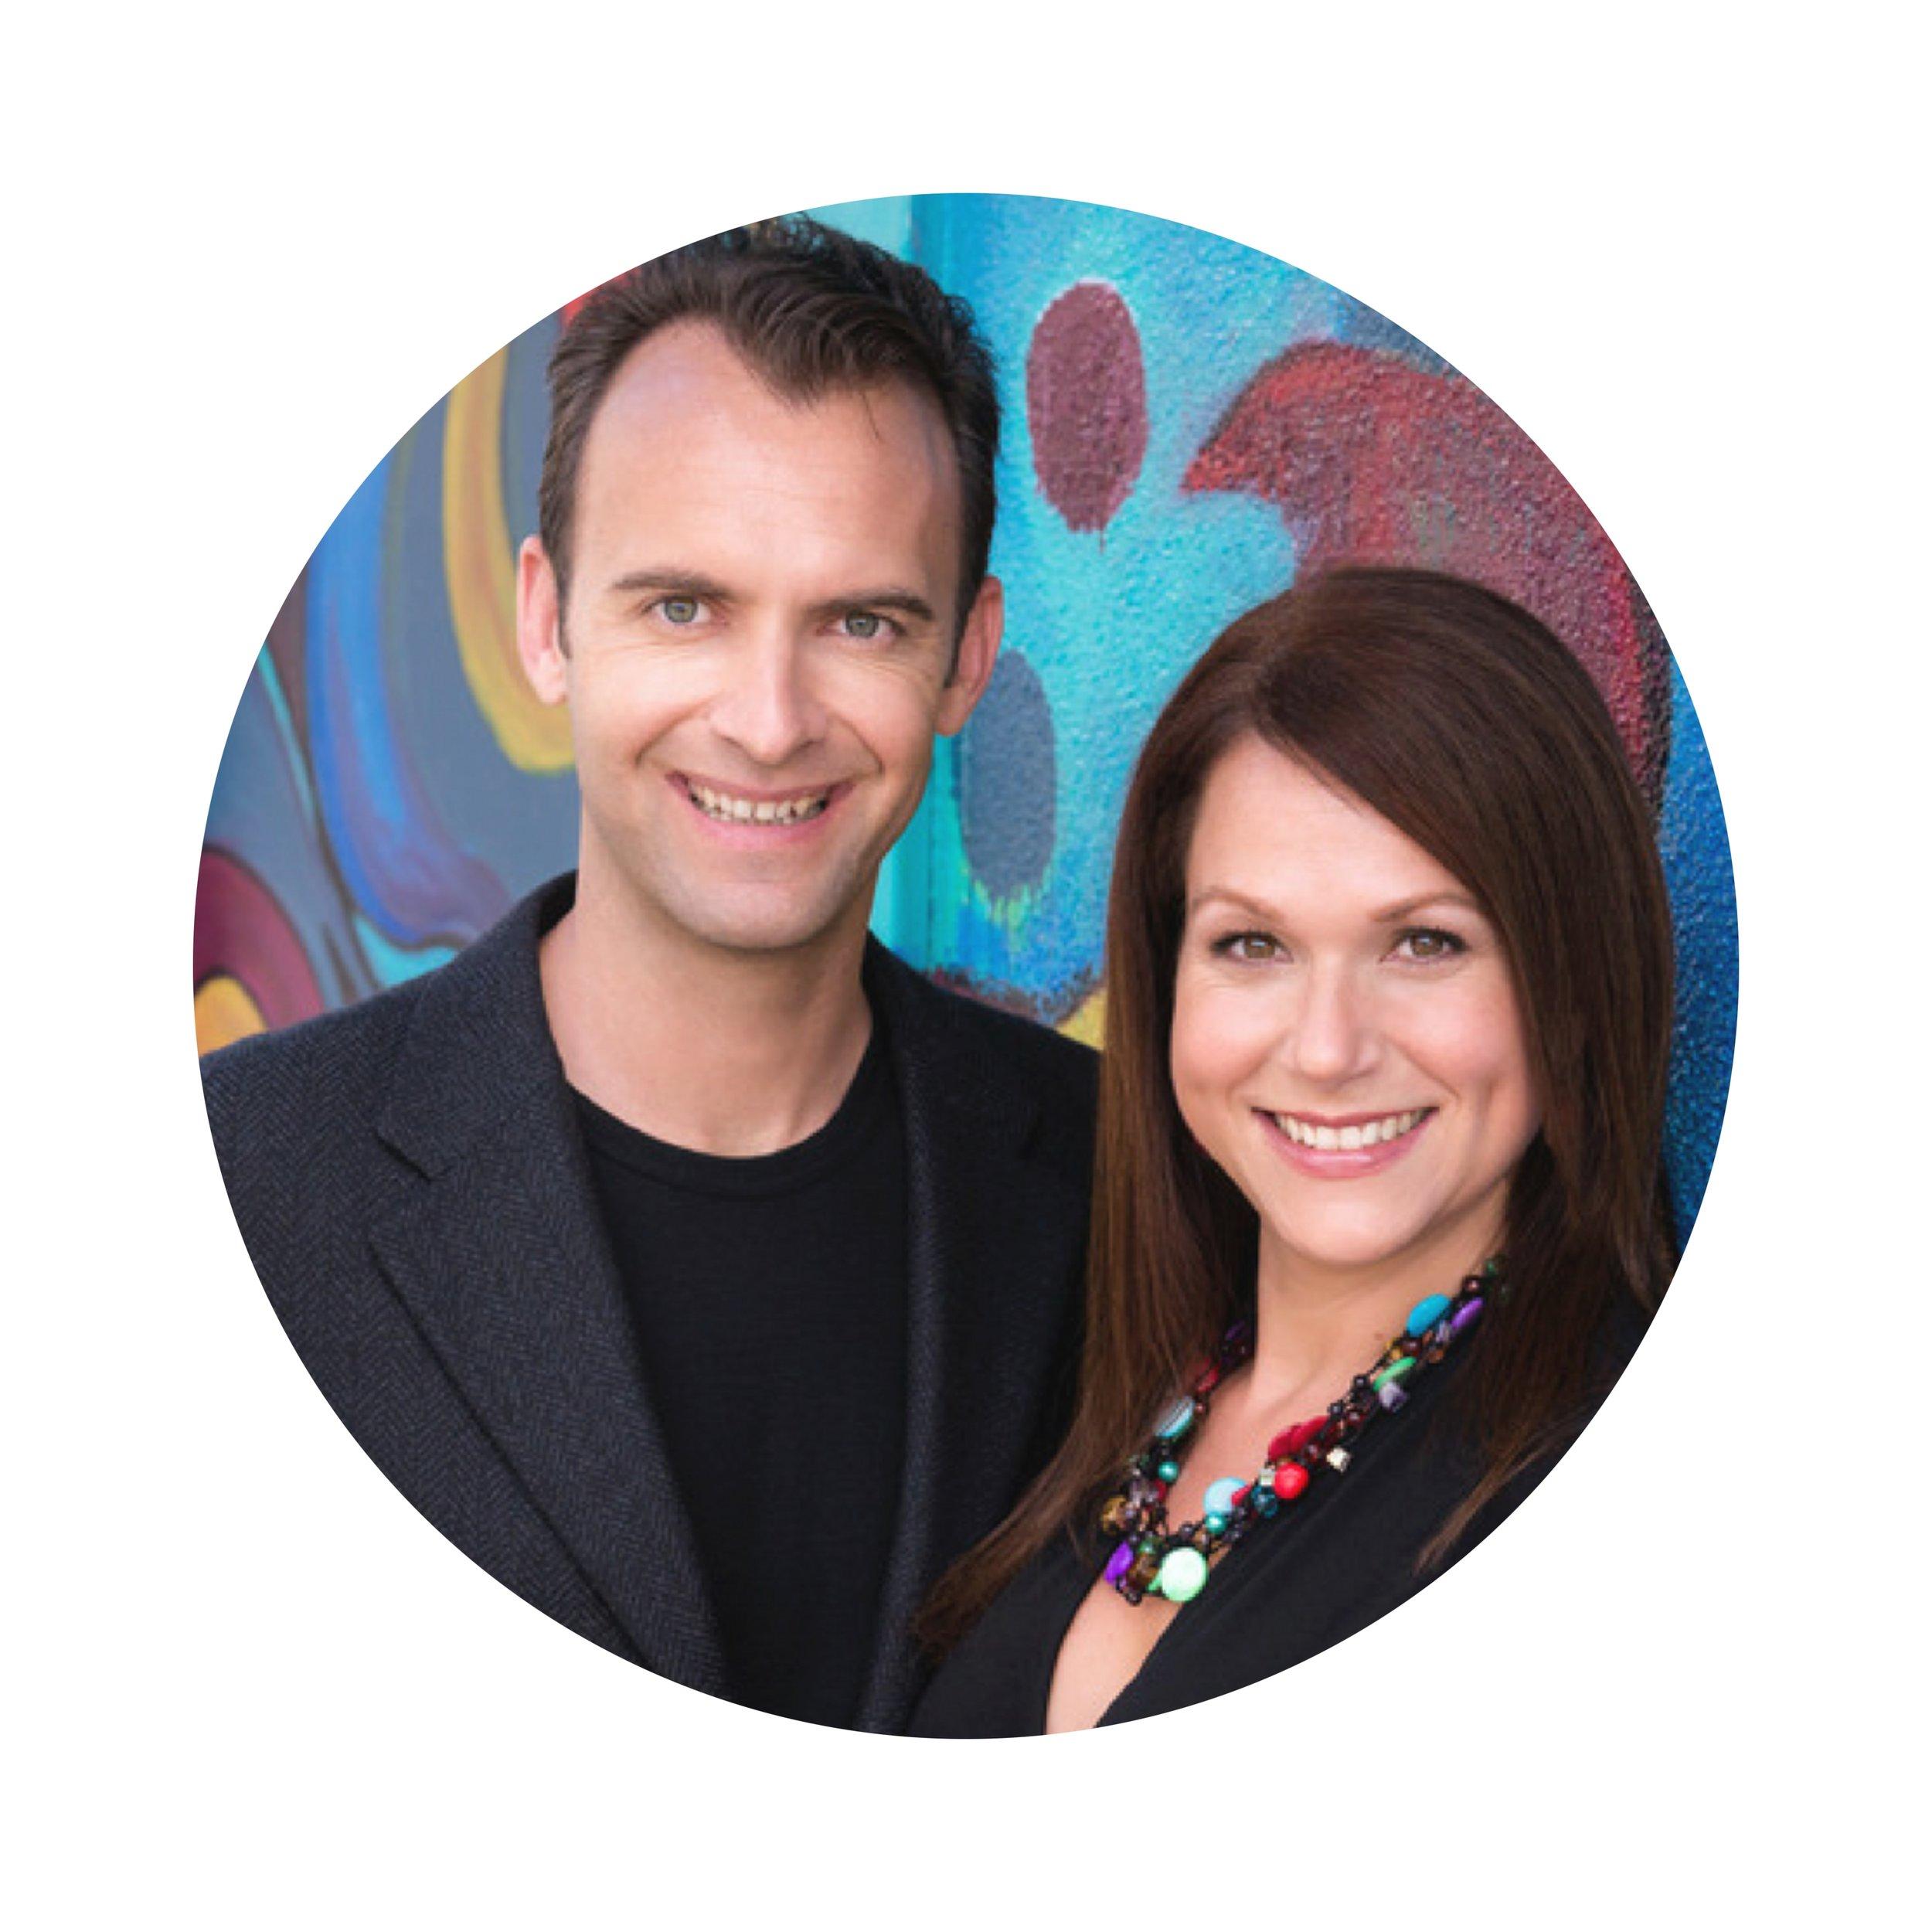 Zeb Severson & Katy Bray